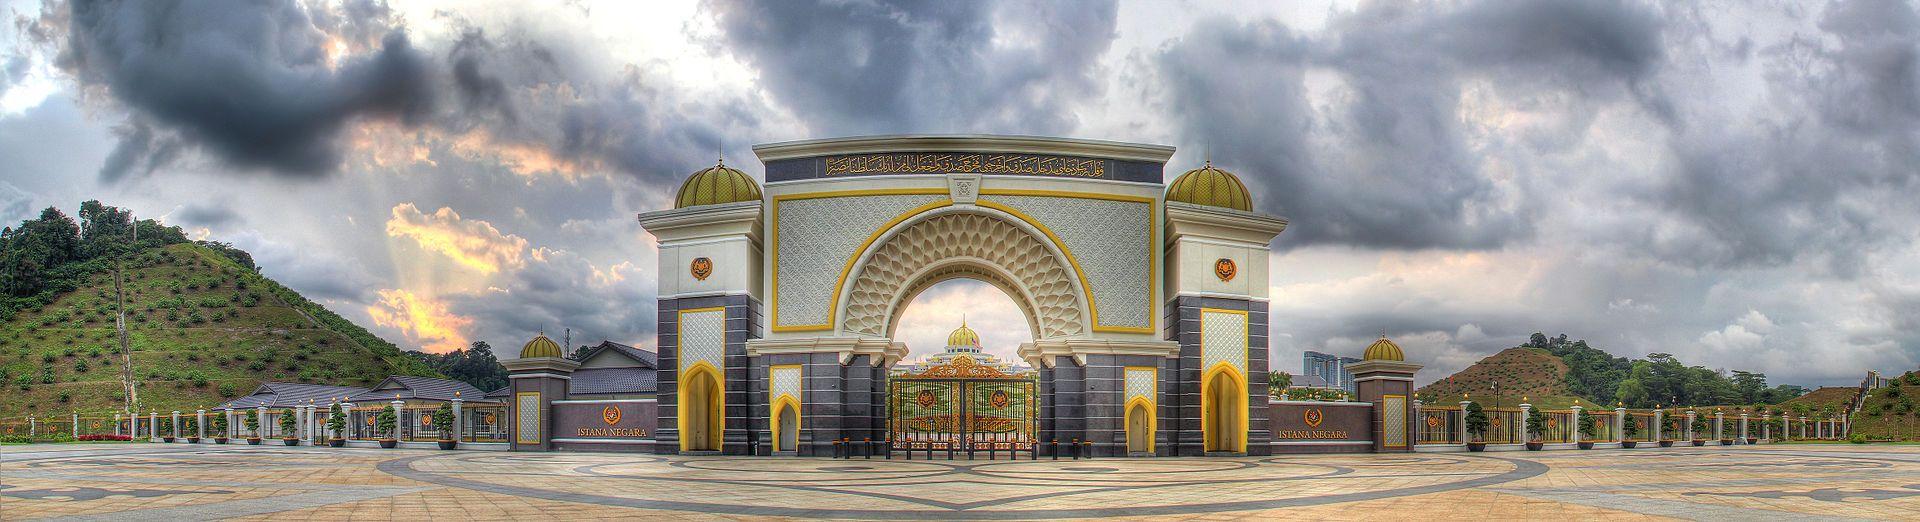 The monumental gate of Istana Negara Jalan Duta, Malaysia ...